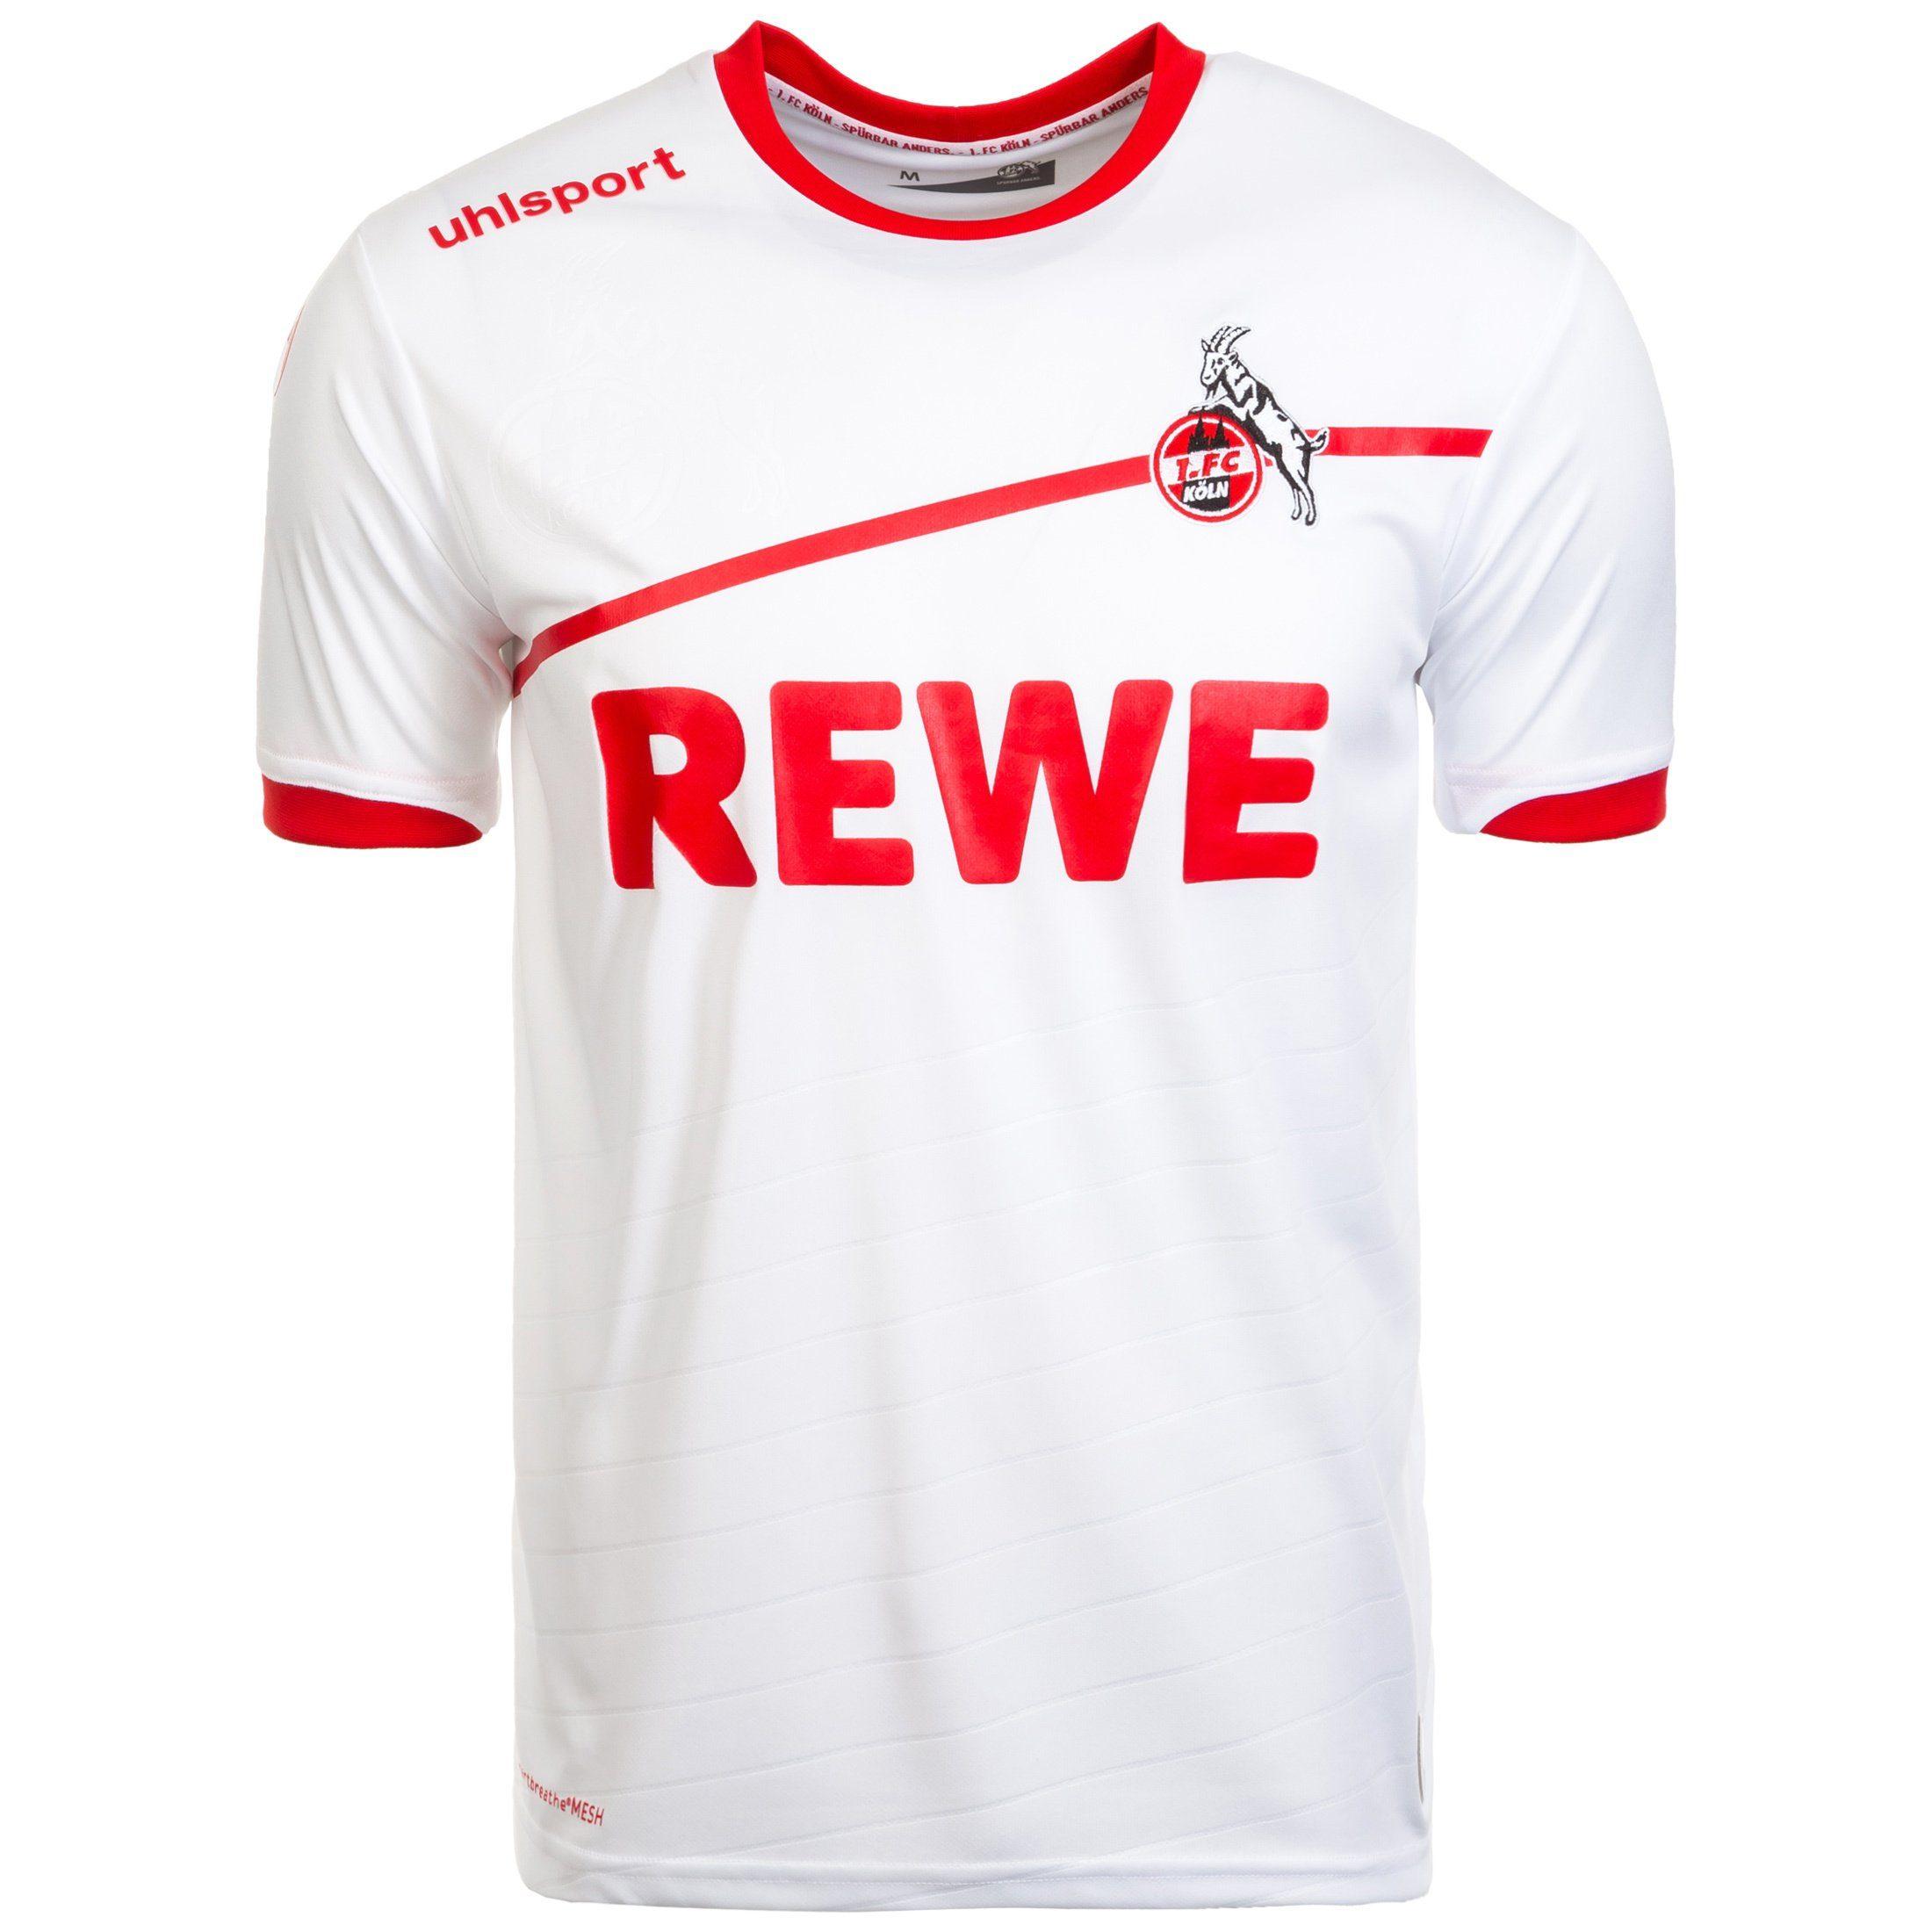 Uhlsport Fußballtrikot 1 Fc Köln 18/19 Heim | Sportbekleidung > Trikots > Sonstige Trikots | Weiß | Uhlsport